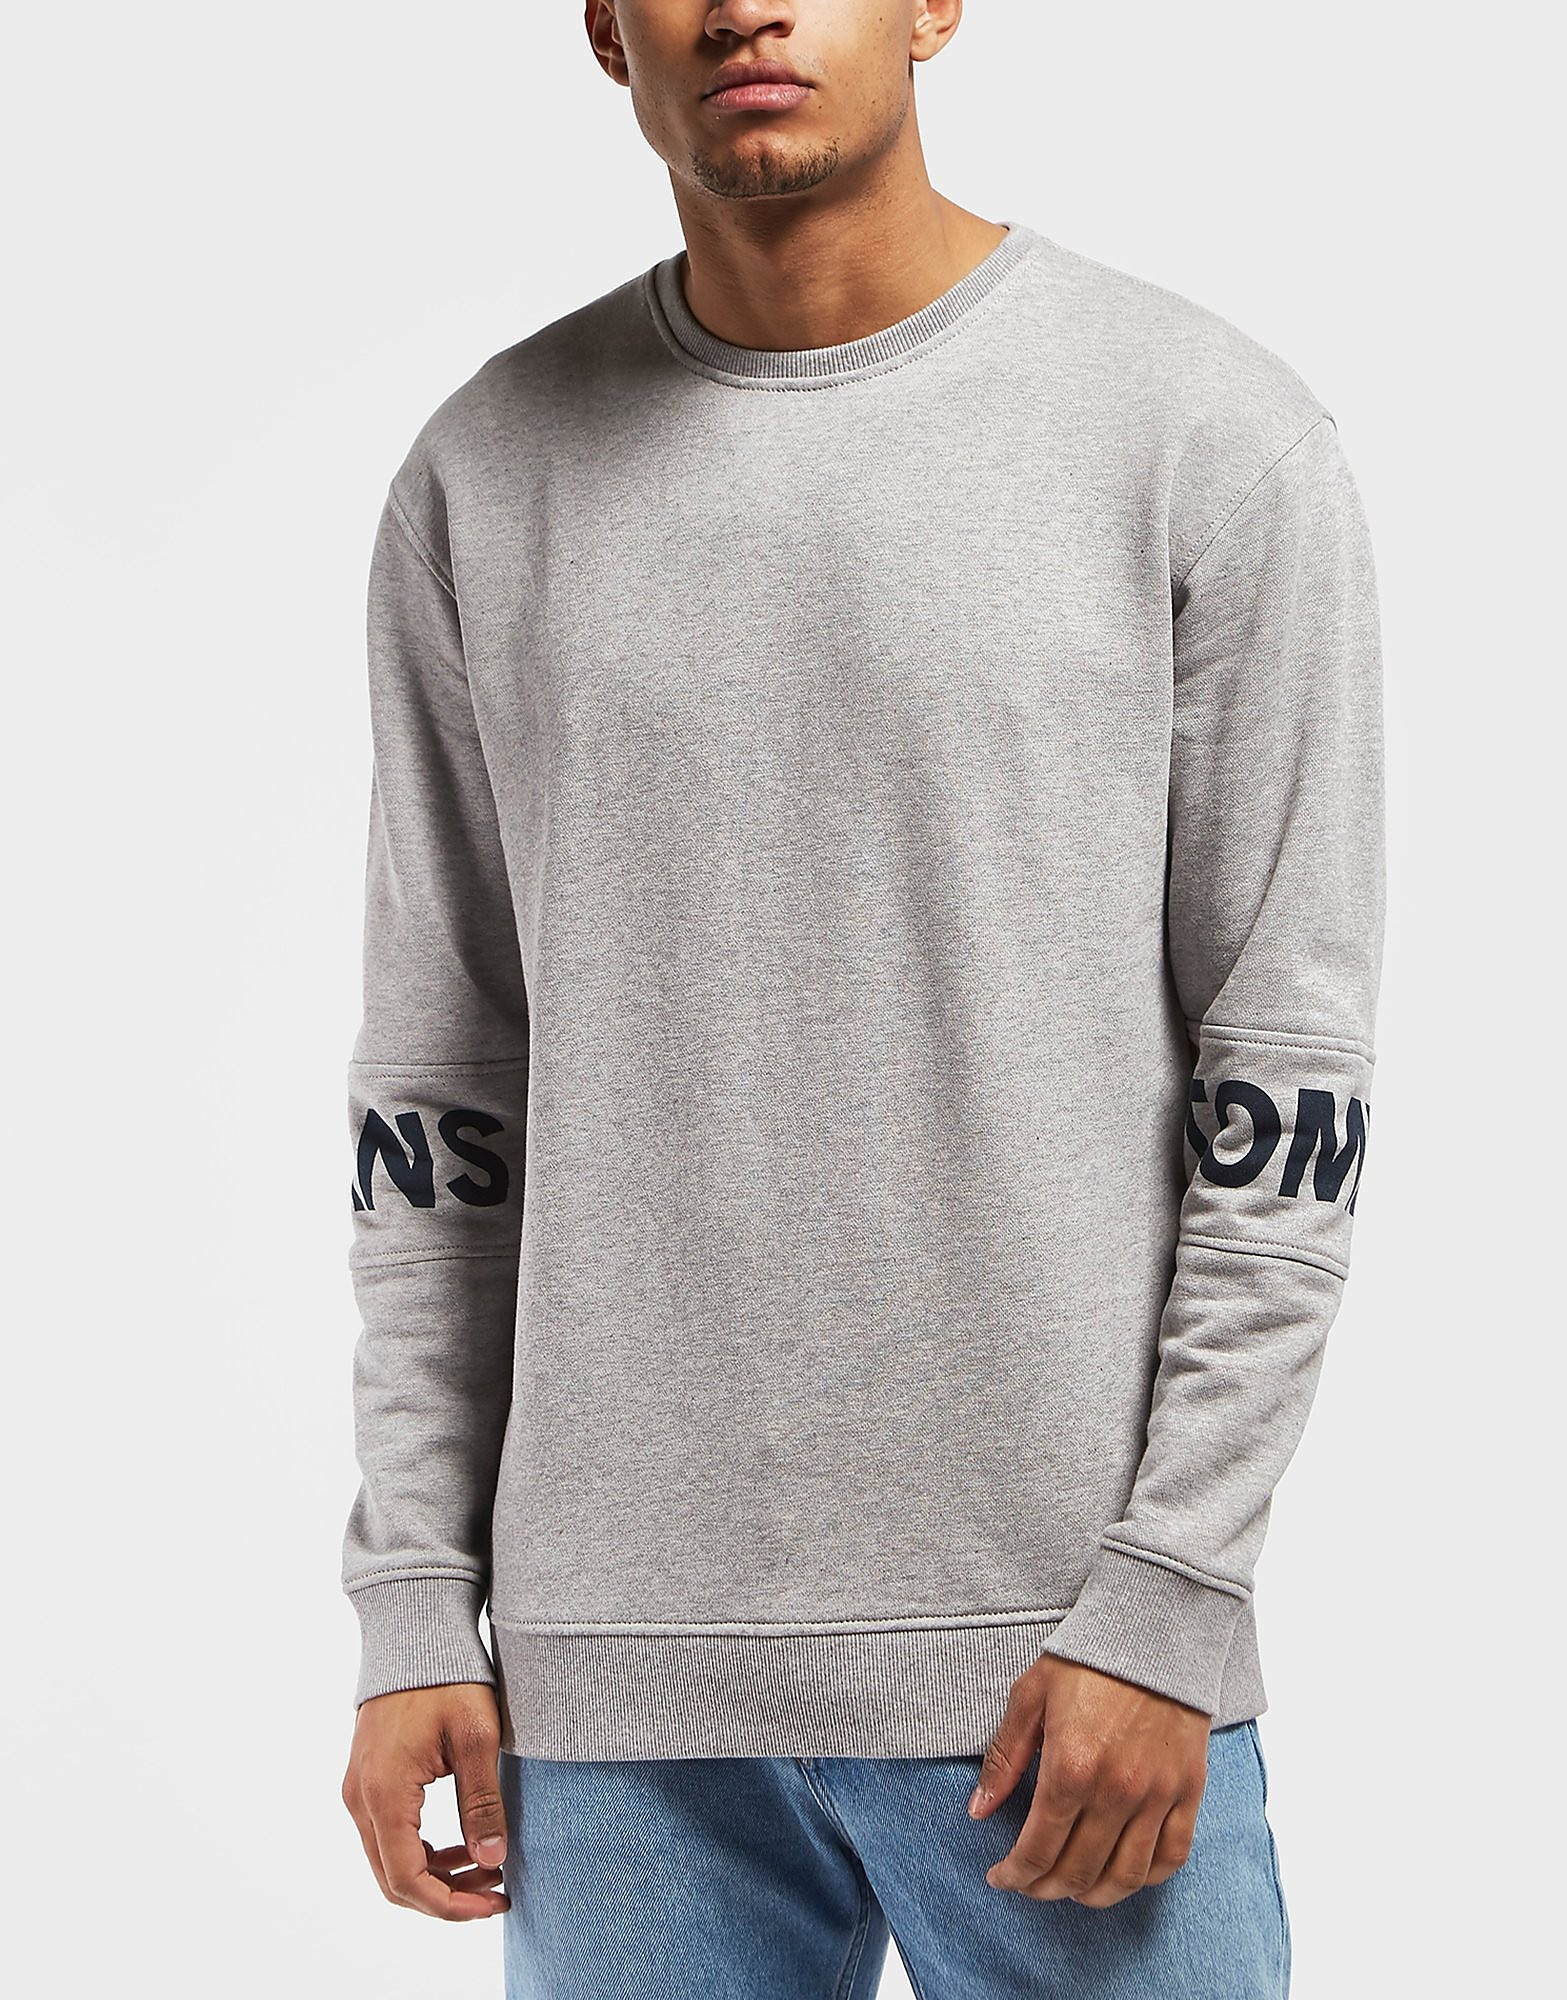 Tommy Hilfiger Sleeve Branded Crew Sweatshirt